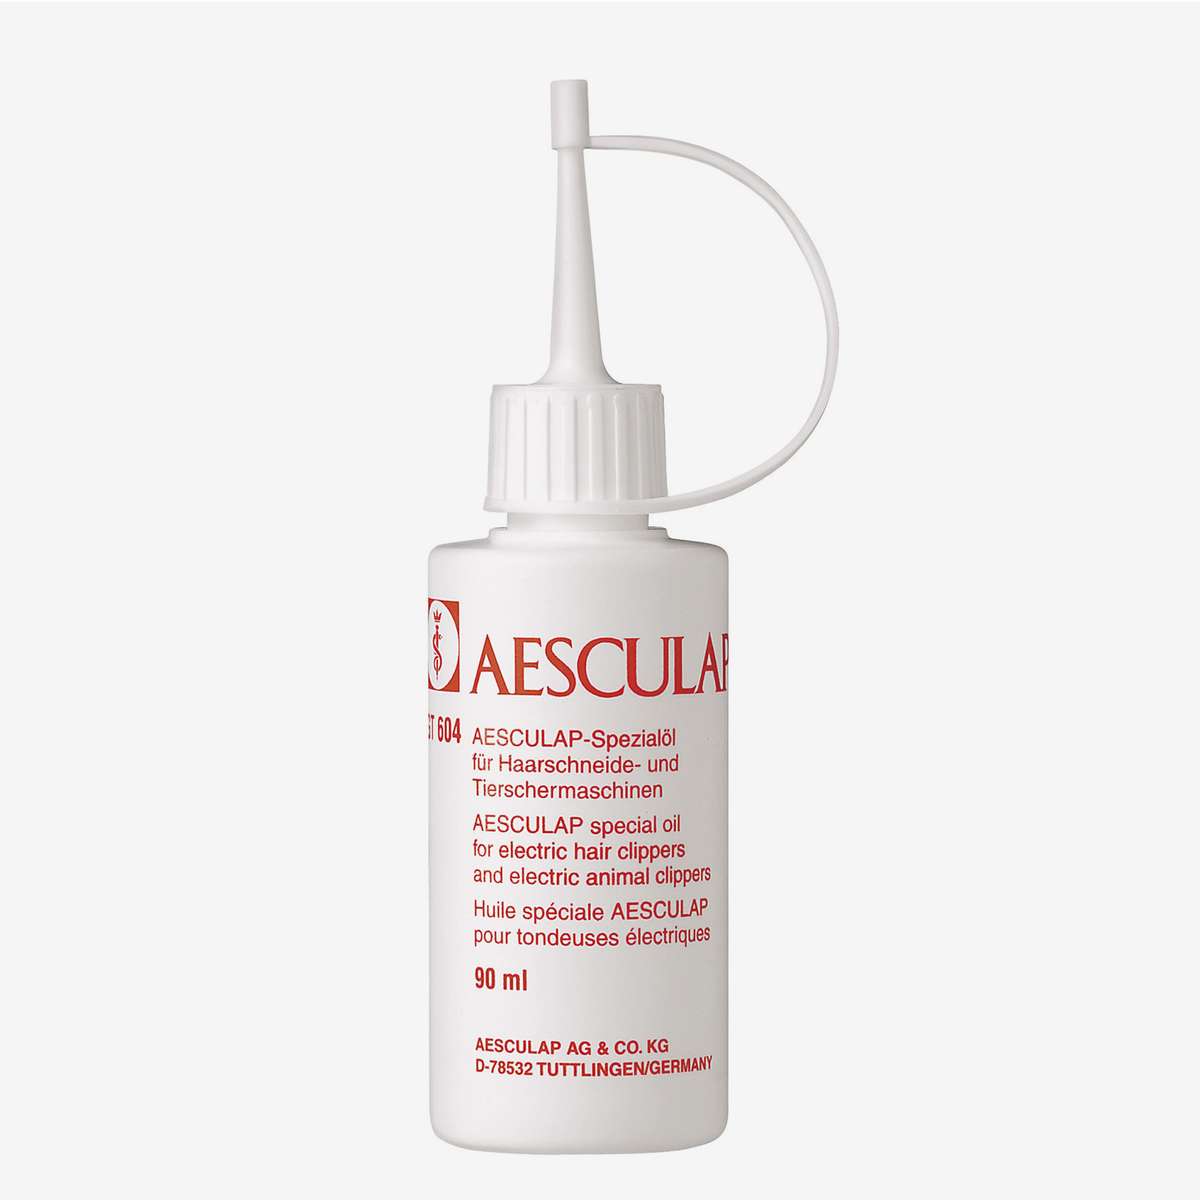 Aesculap Clipper oil 90ml